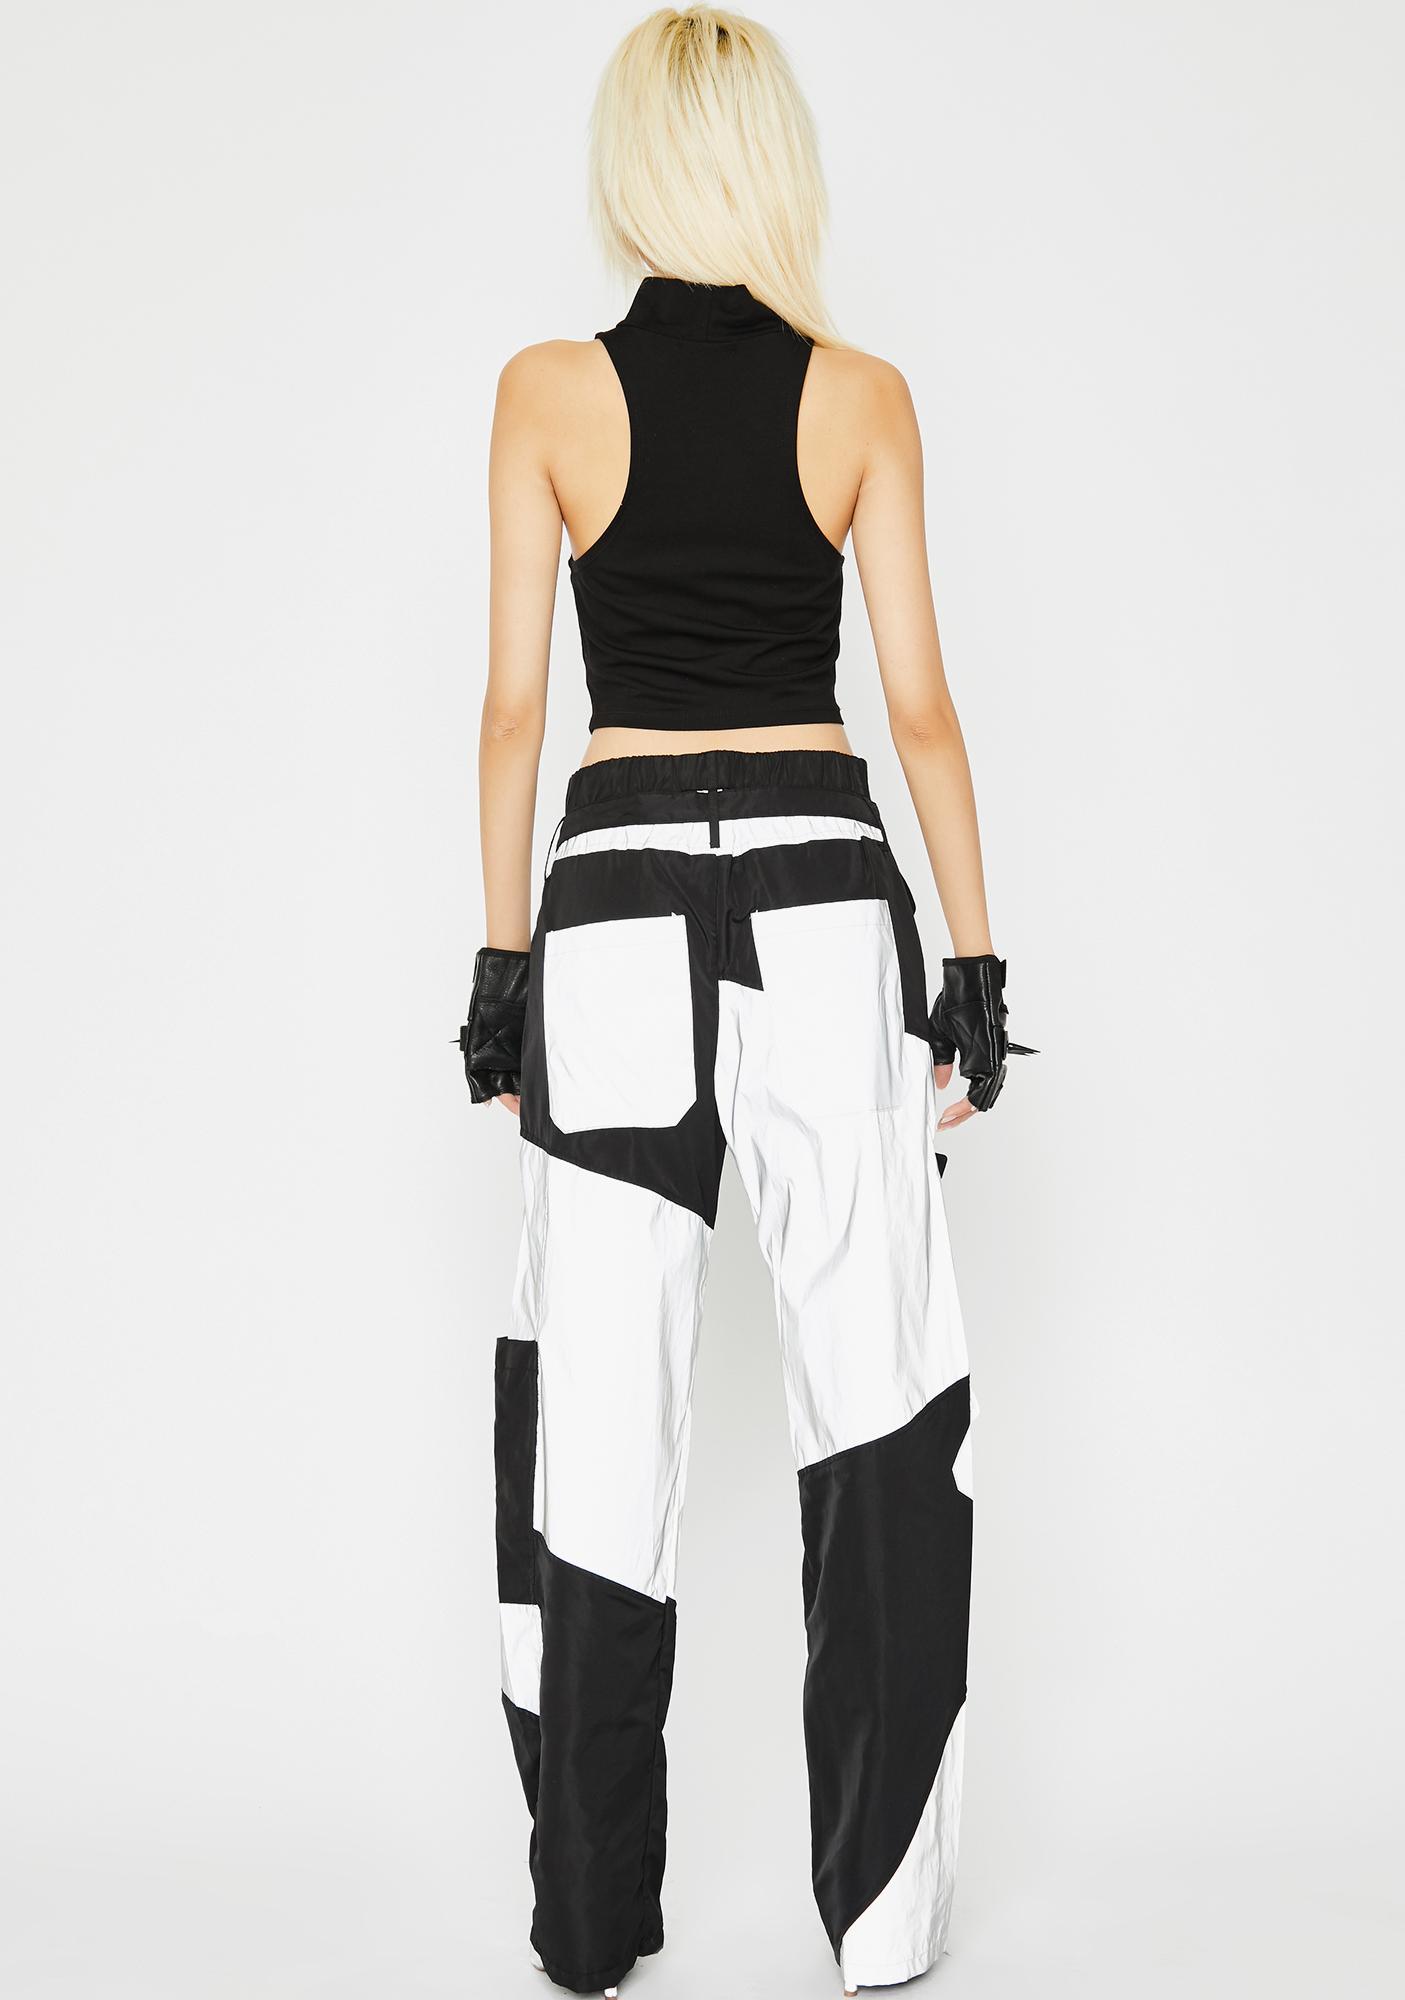 Radiatin' Rave Reflective Pants